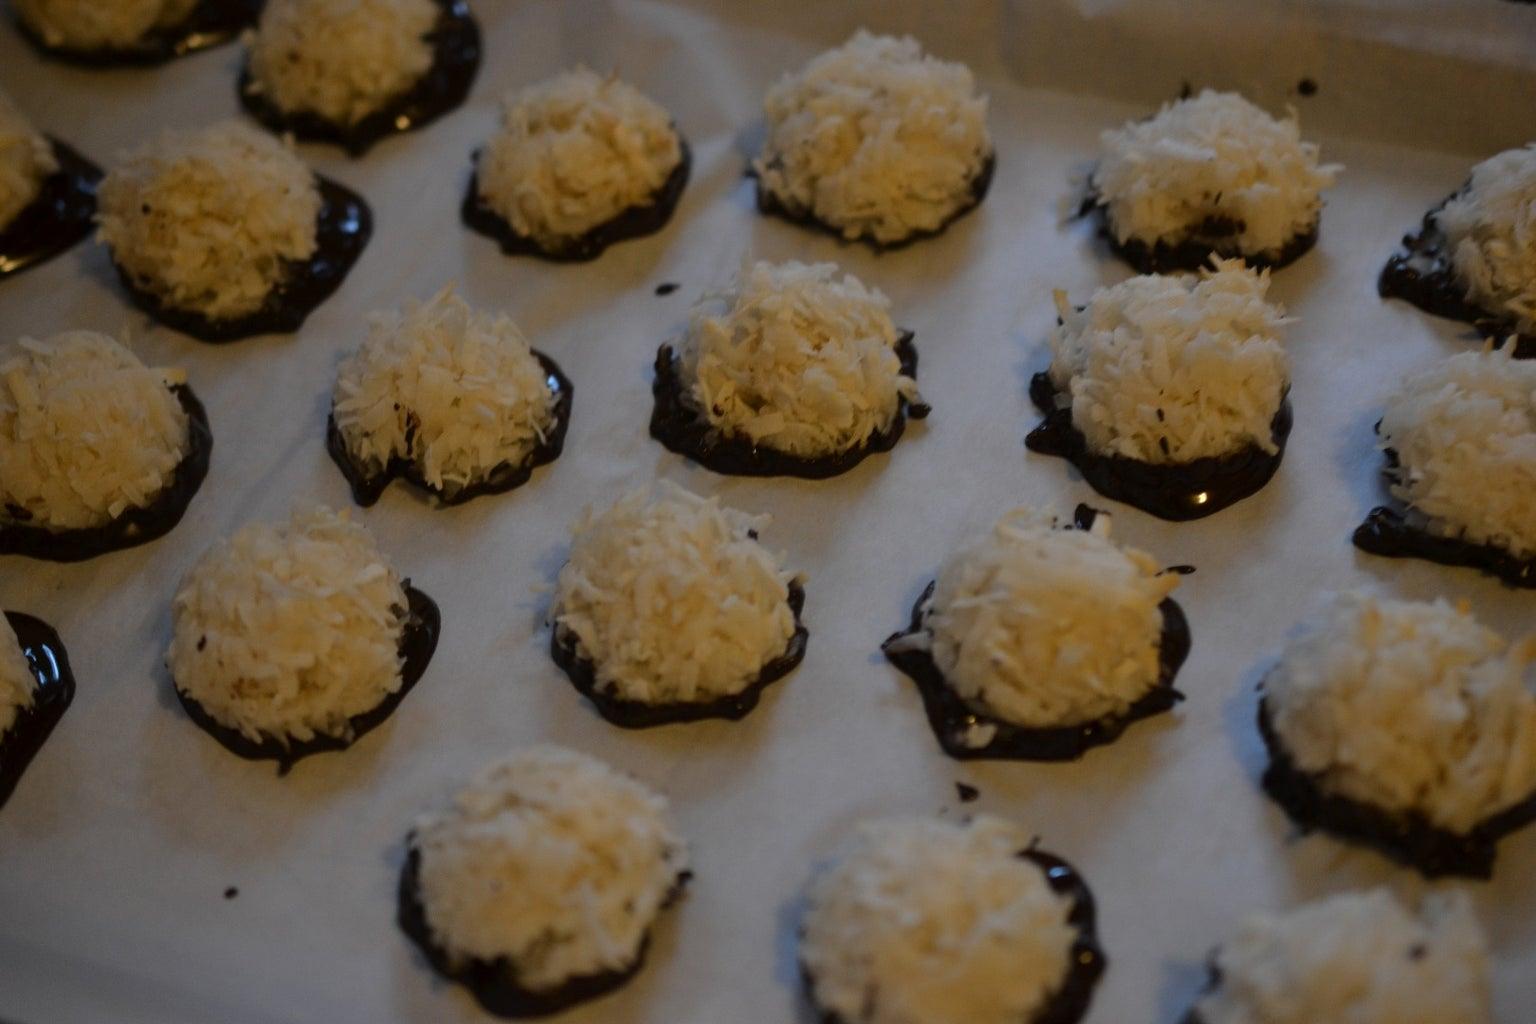 Dip Coconut Macaroons in Chocolate